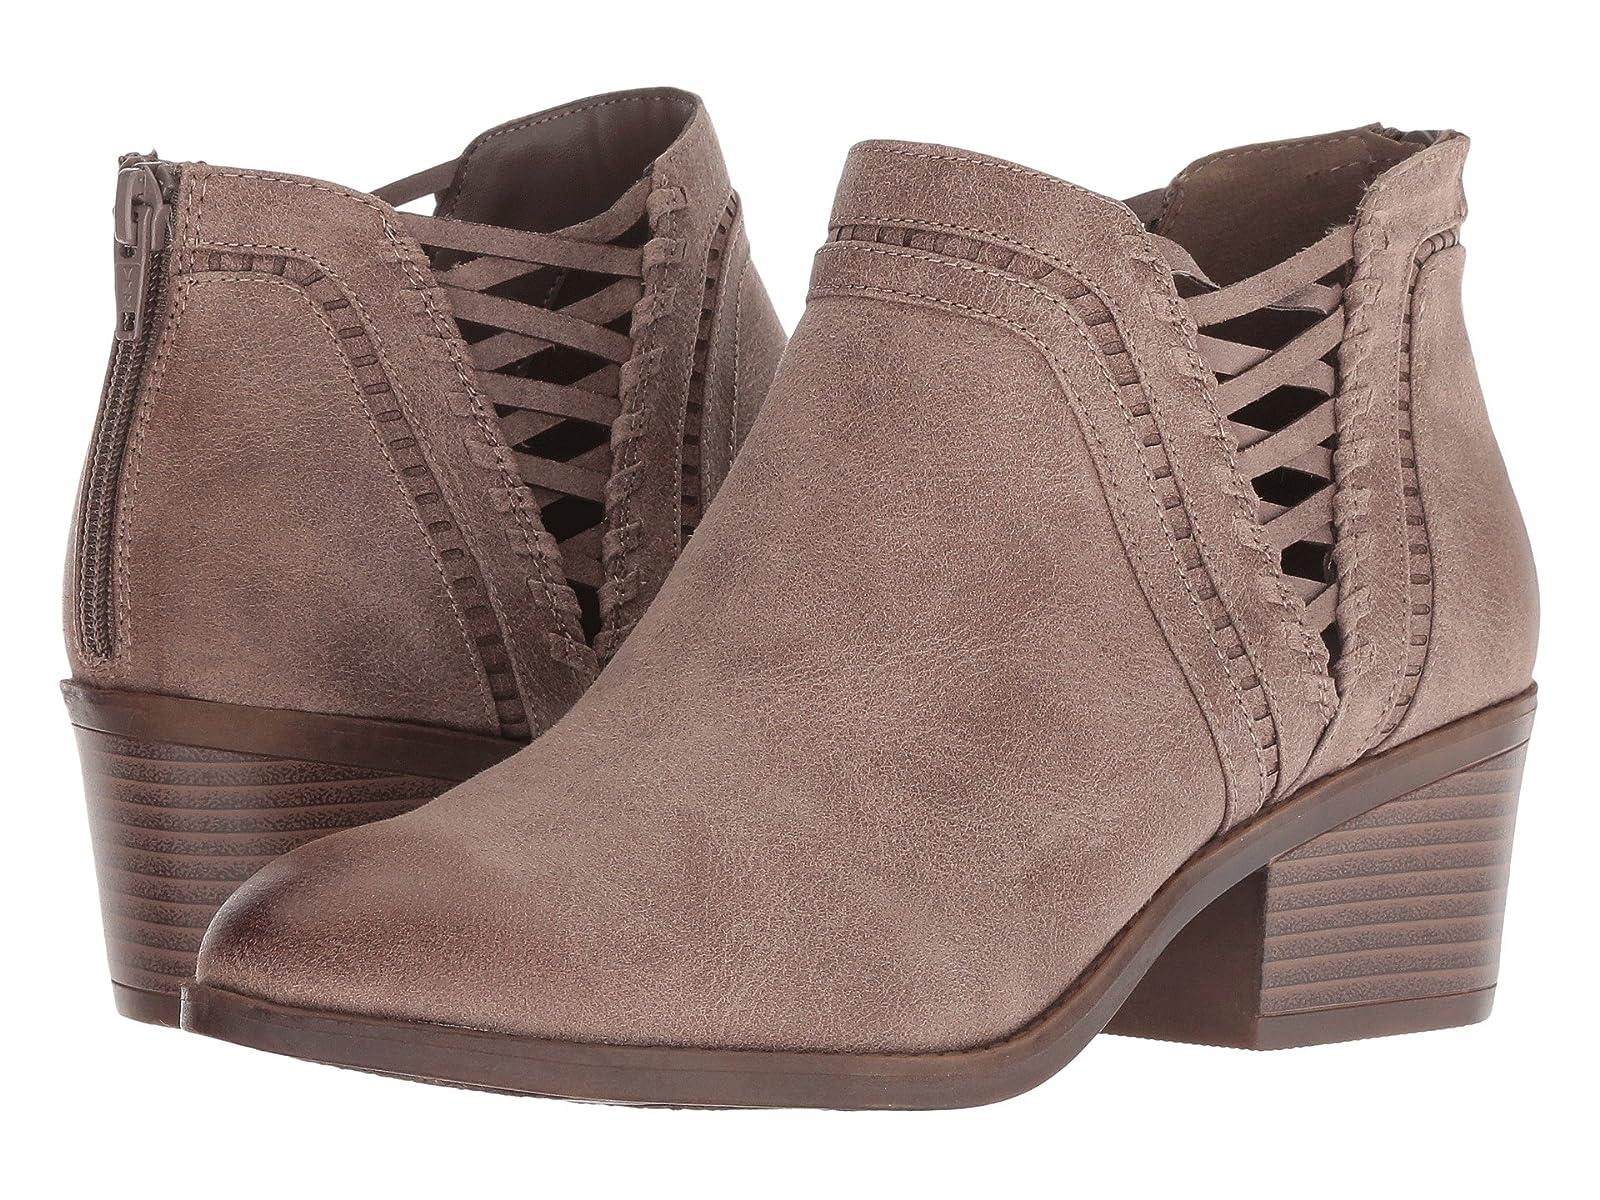 Fergalicious WisdomCheap and distinctive eye-catching shoes